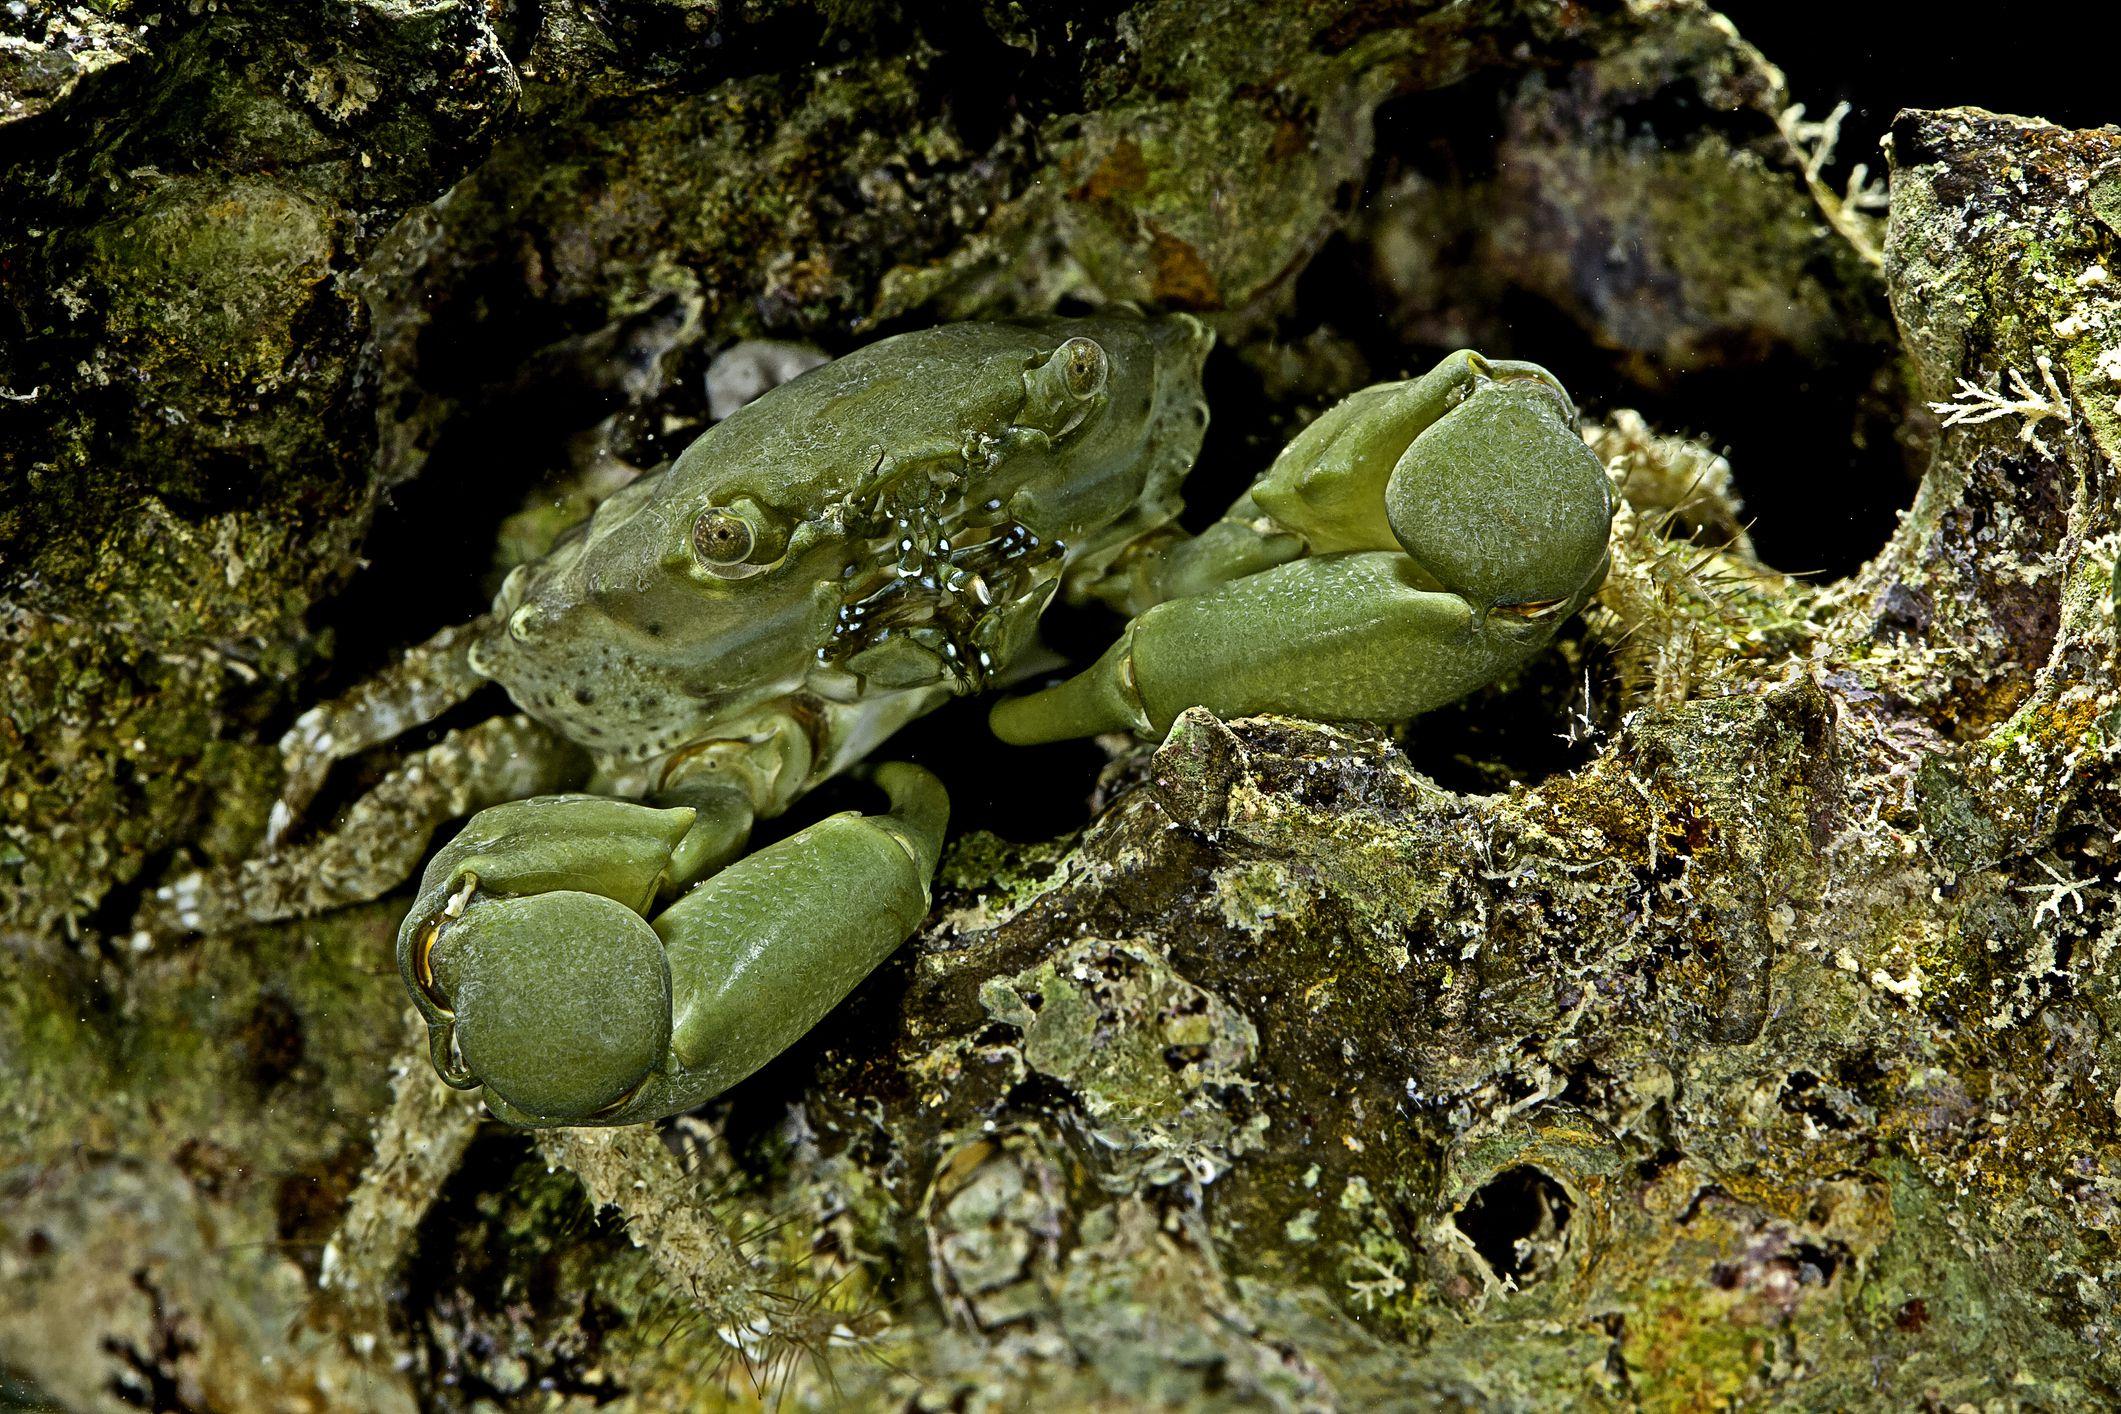 Mithraculus sculptus (green clinging crab)